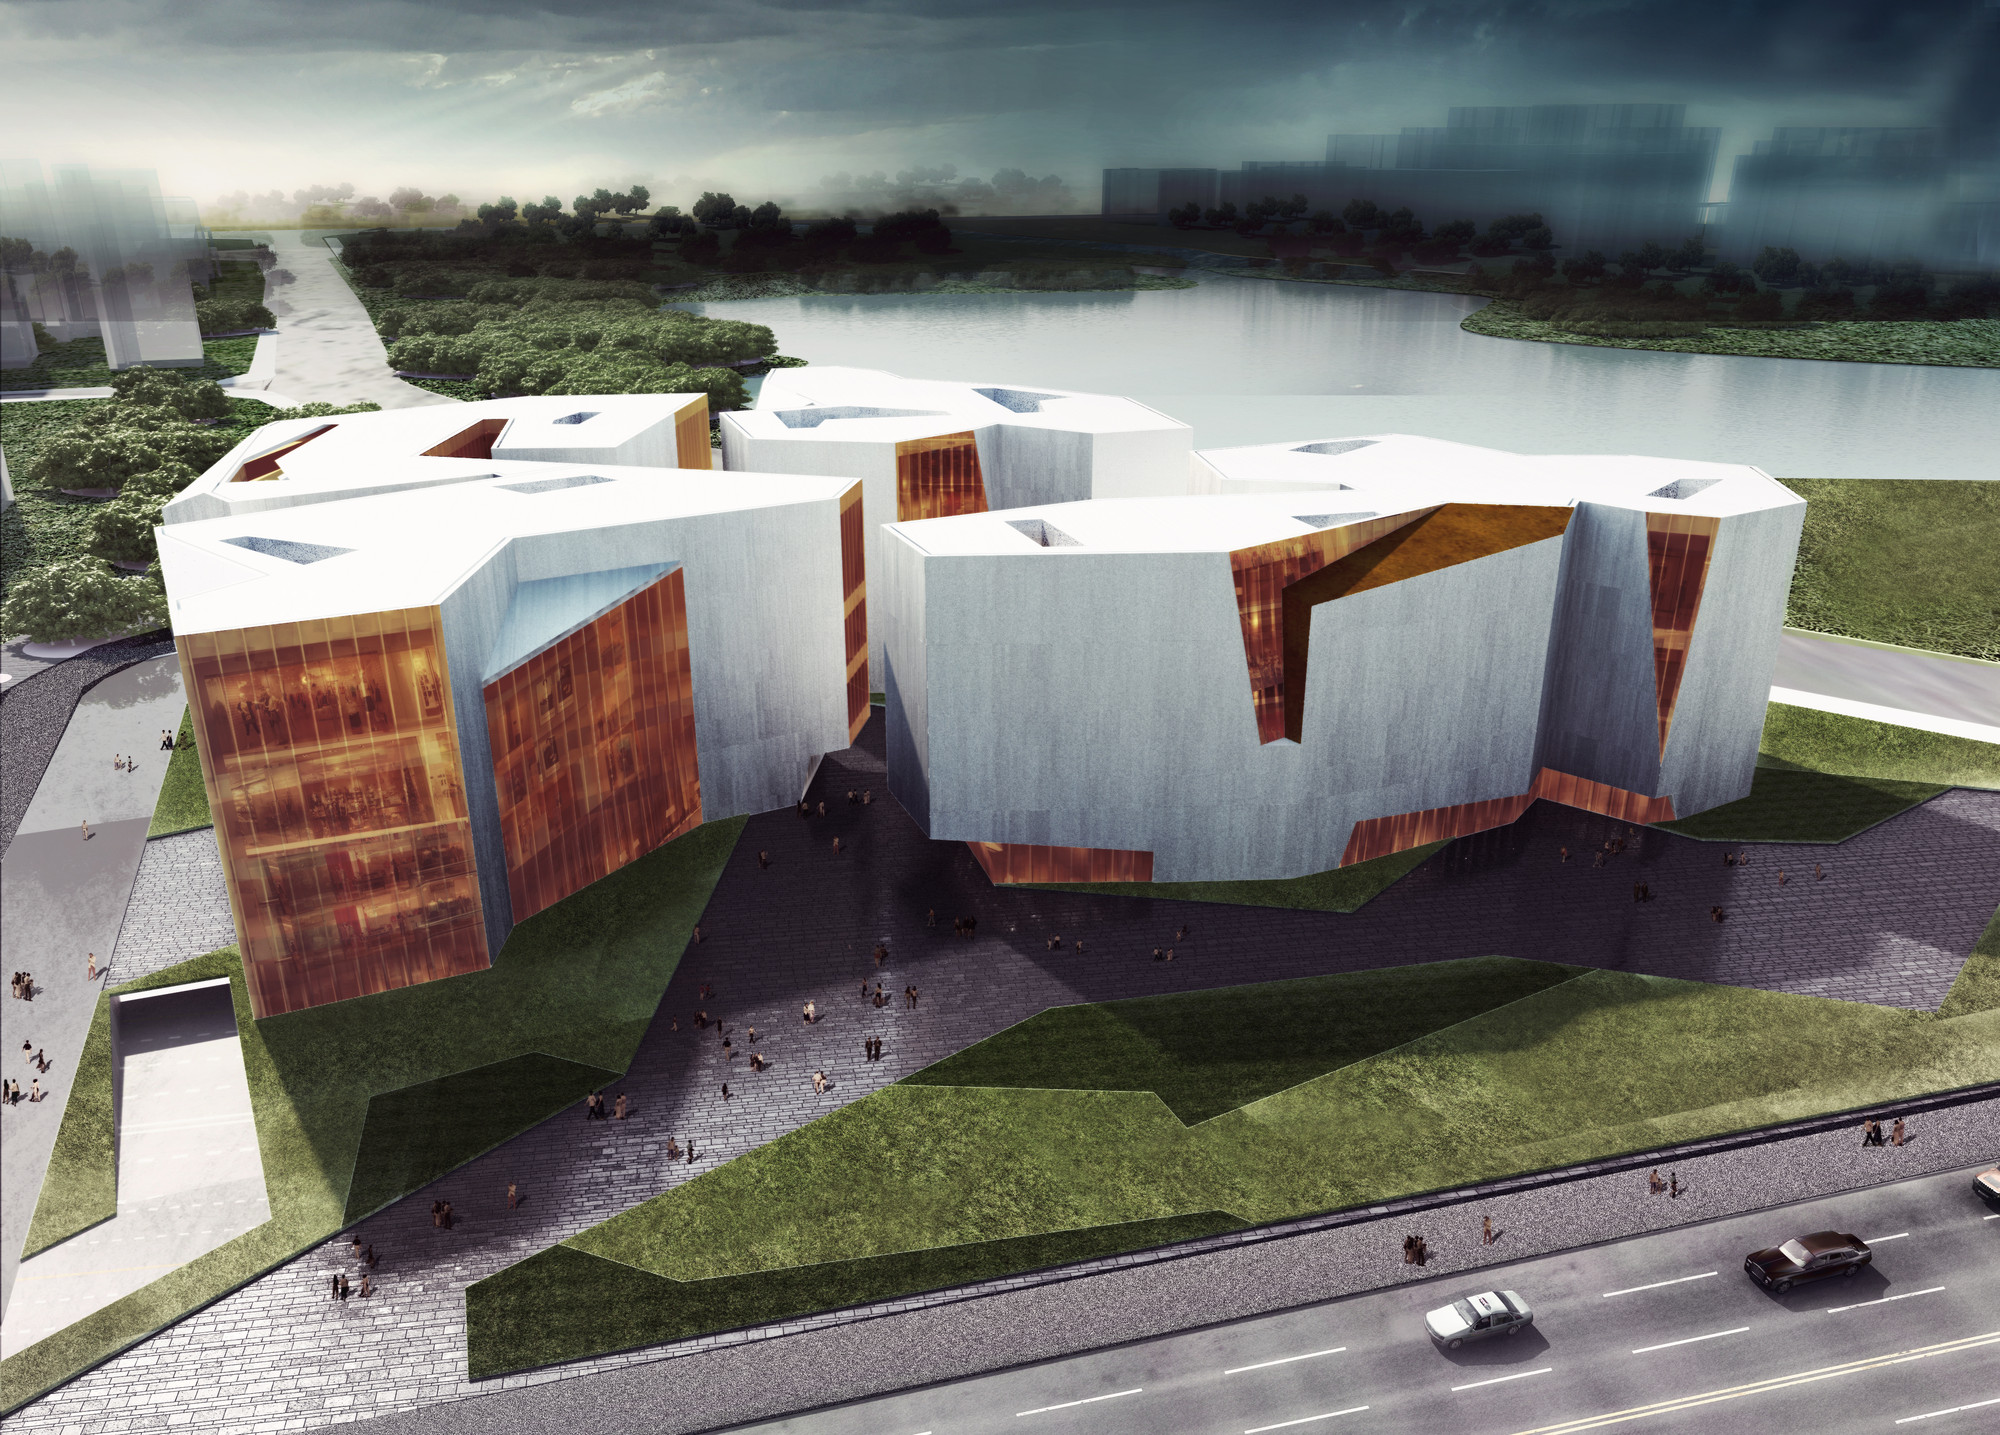 RTA-Office, primer lugar en concurso de Centro Cultural en Wuhu, China, Cortesia de RTA-Office